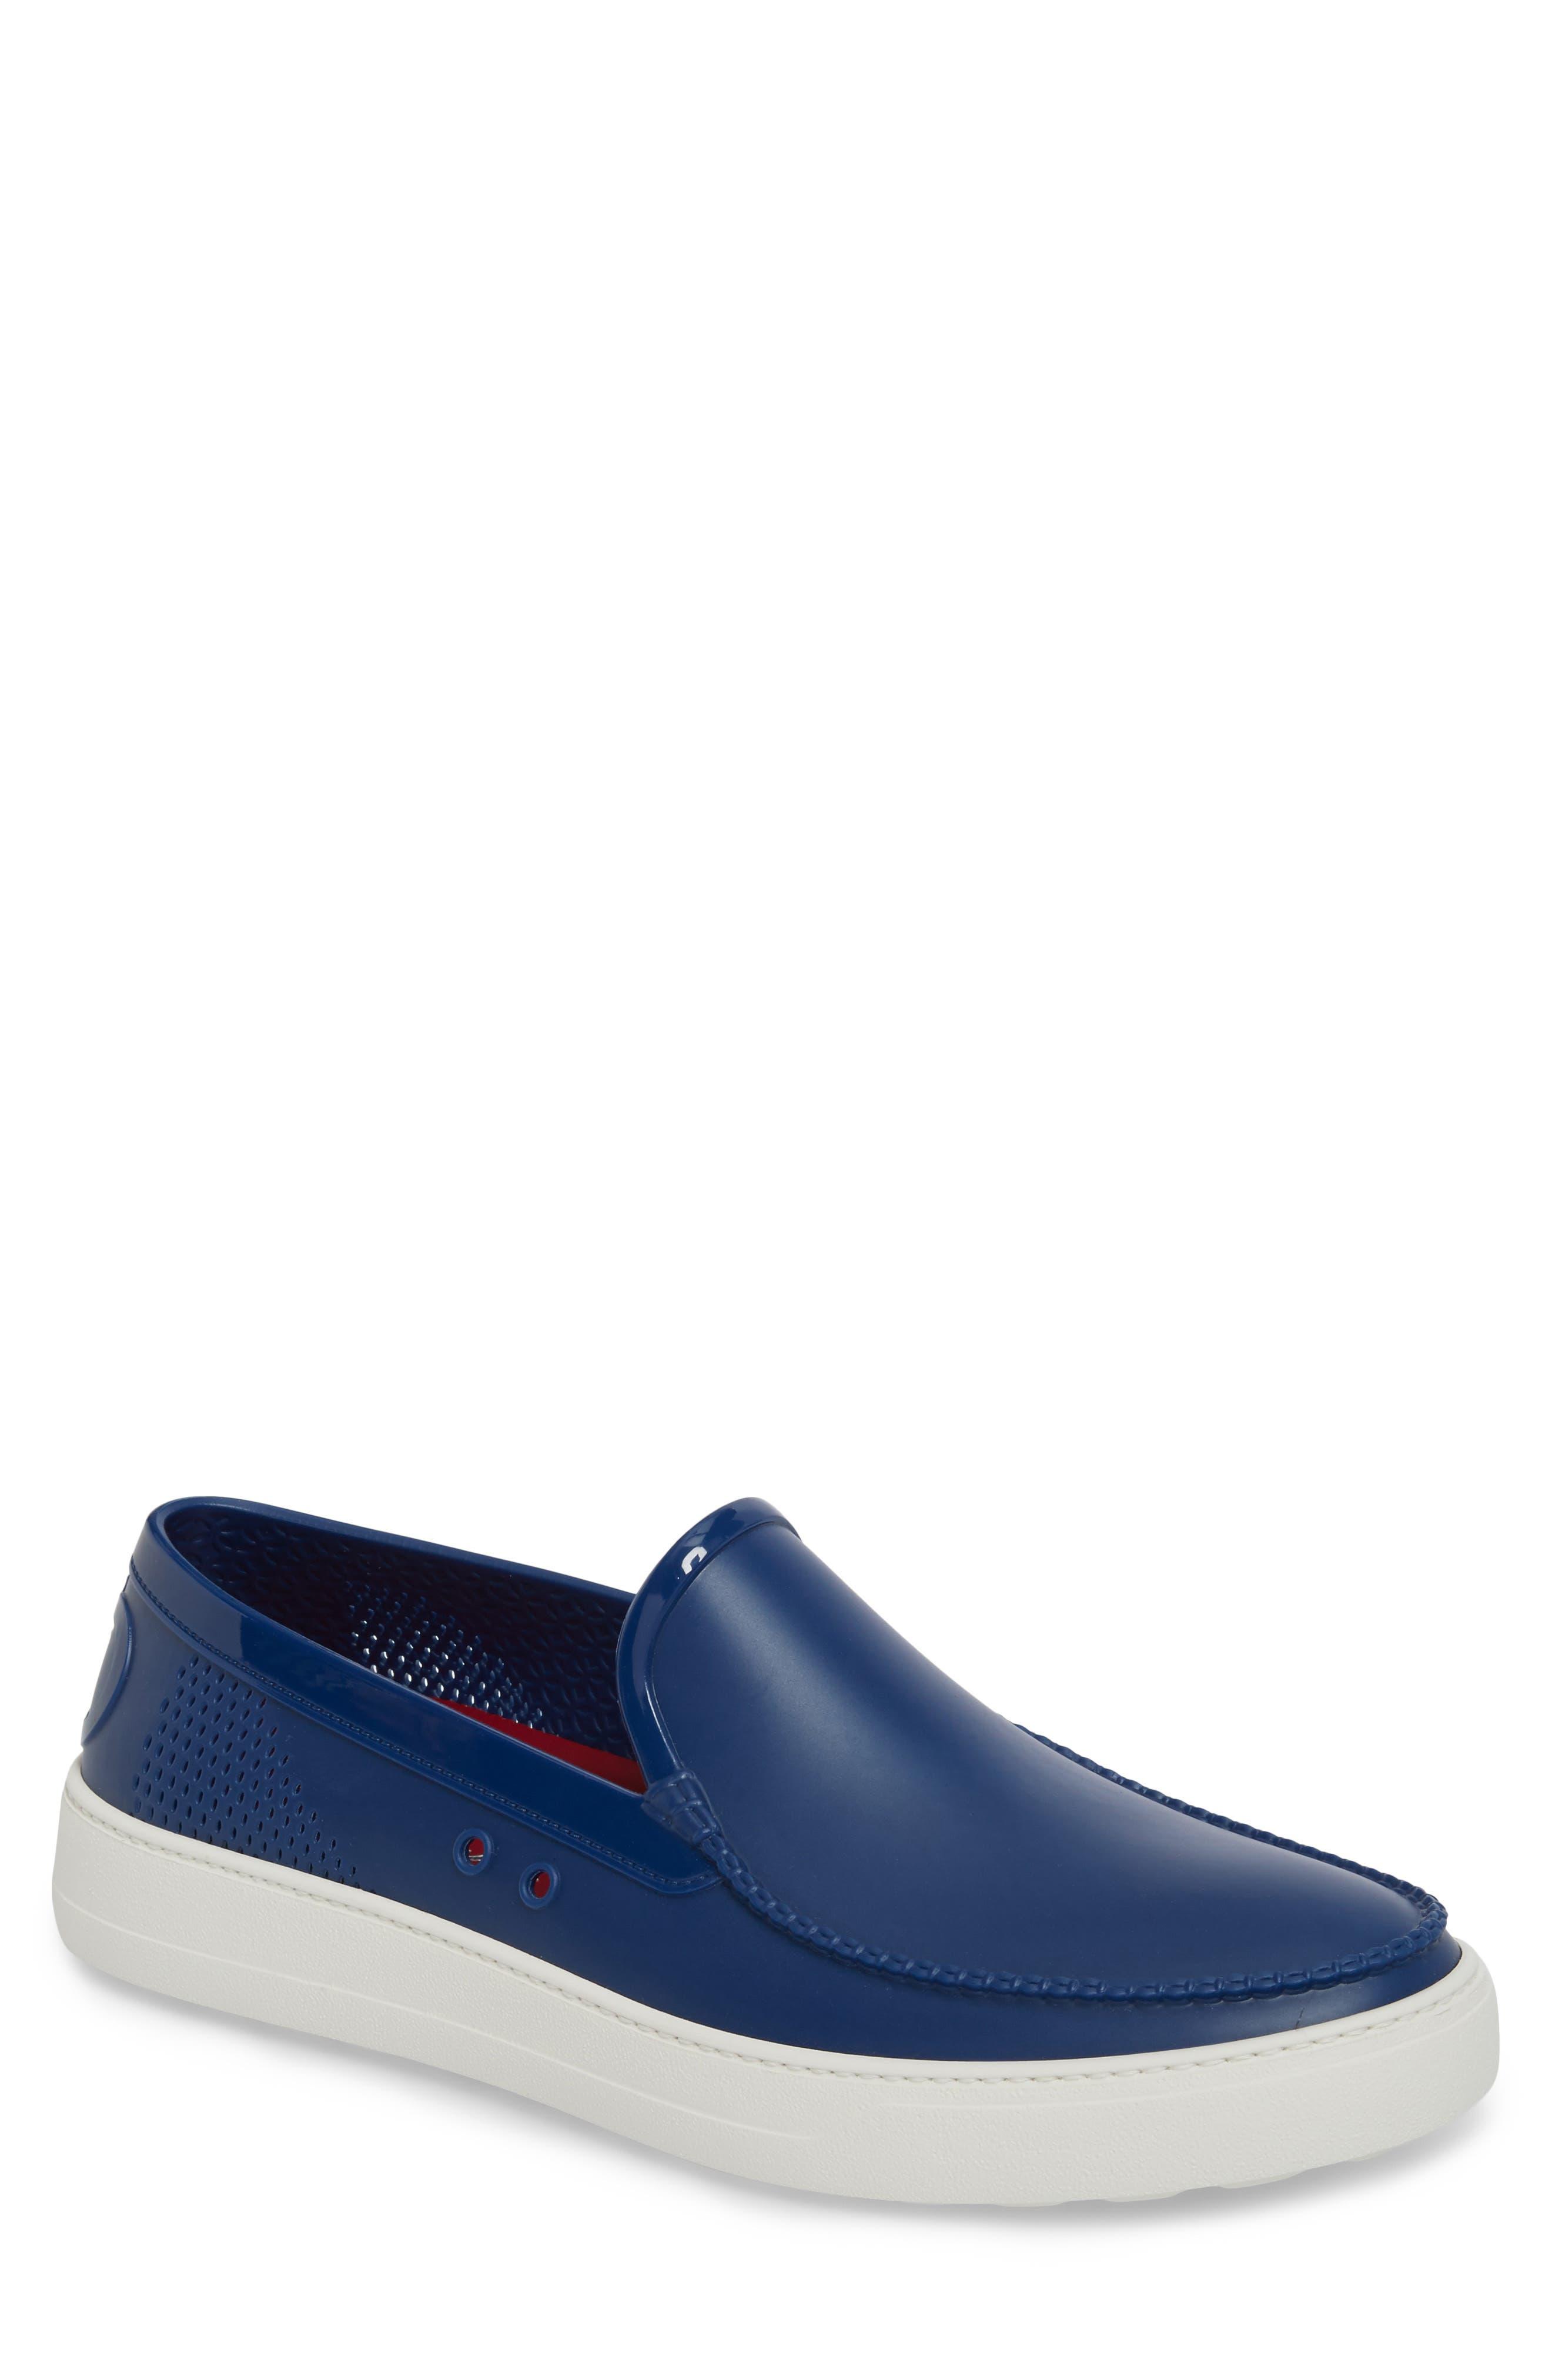 Fury Slip-On Sneaker,                             Main thumbnail 1, color,                             JET BLUE LEATHER